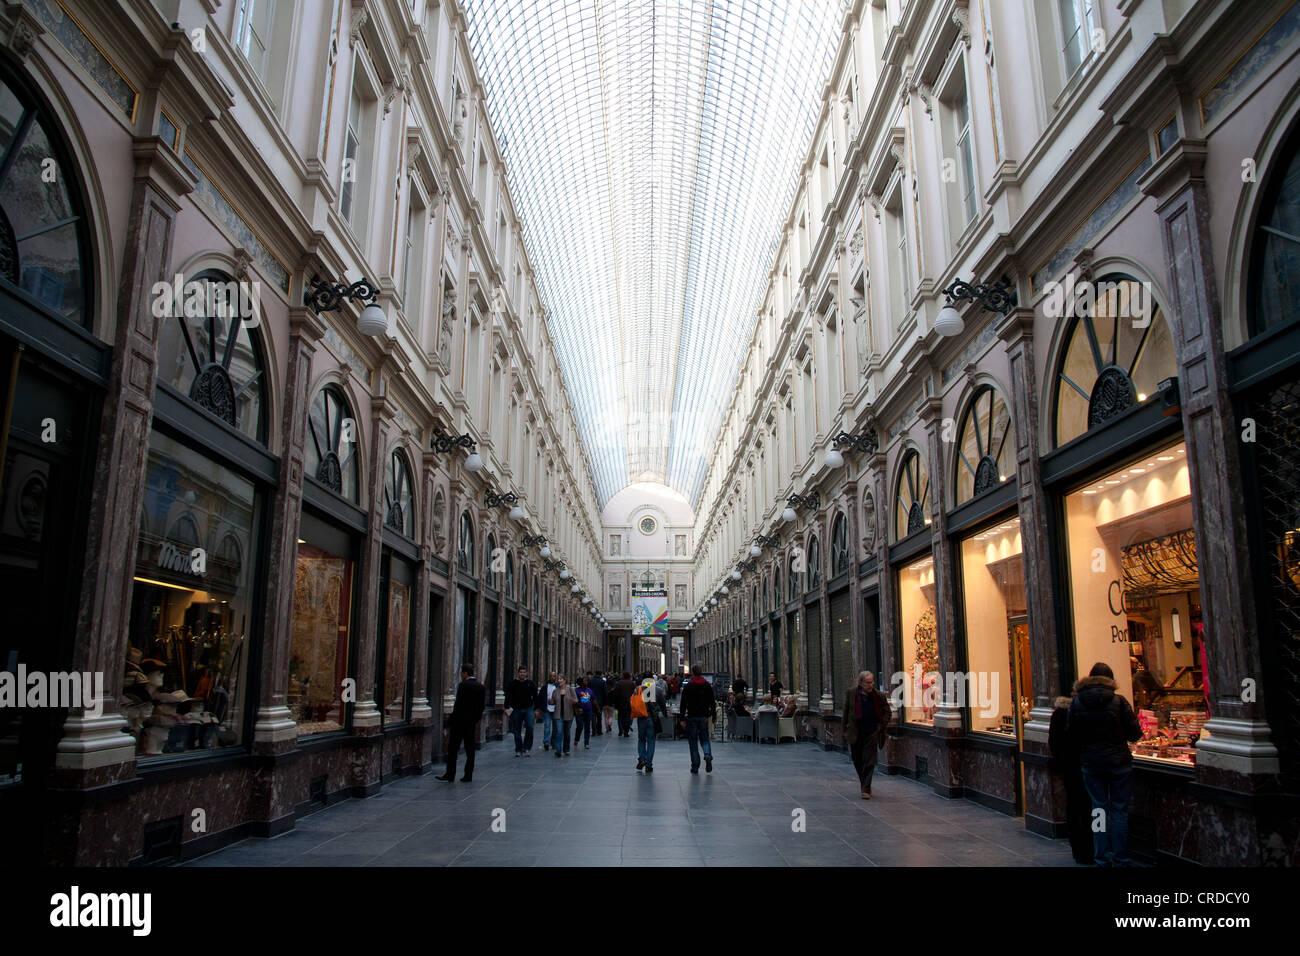 The Galeries Royales Saint-Hubert  or Koninklijke Sint- Hubertusgalerijen Brussels Belgium - Stock Image